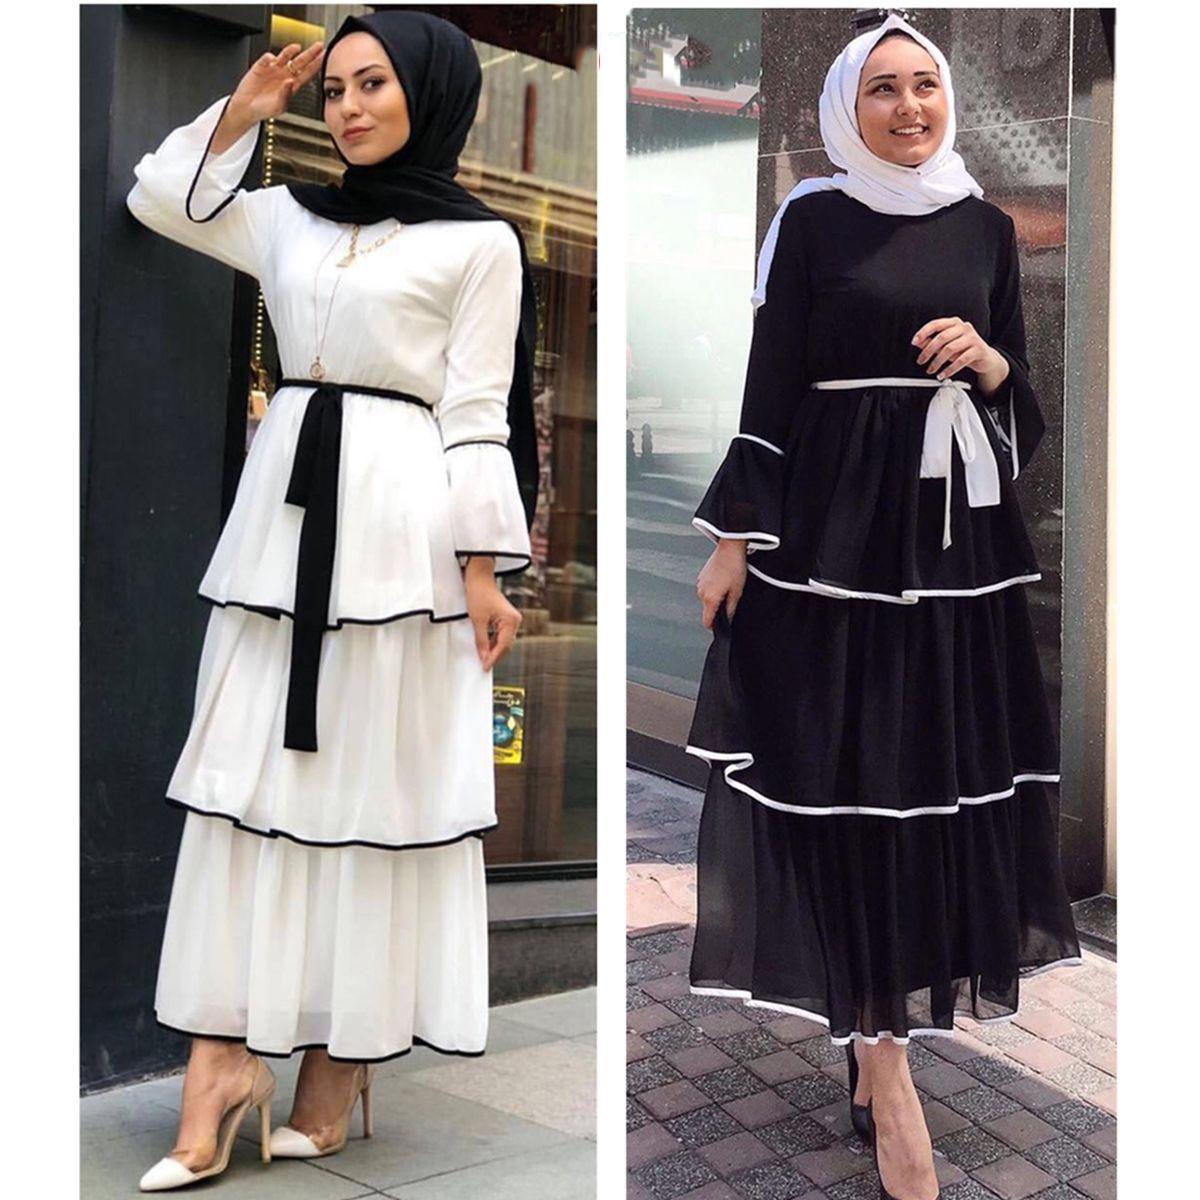 Abaya Dubai Turkey Muslim Dress Kaftan Caftan Chiffon Islamic Clothing For Women Musulmane Ramadan Layered Round Neck Robe